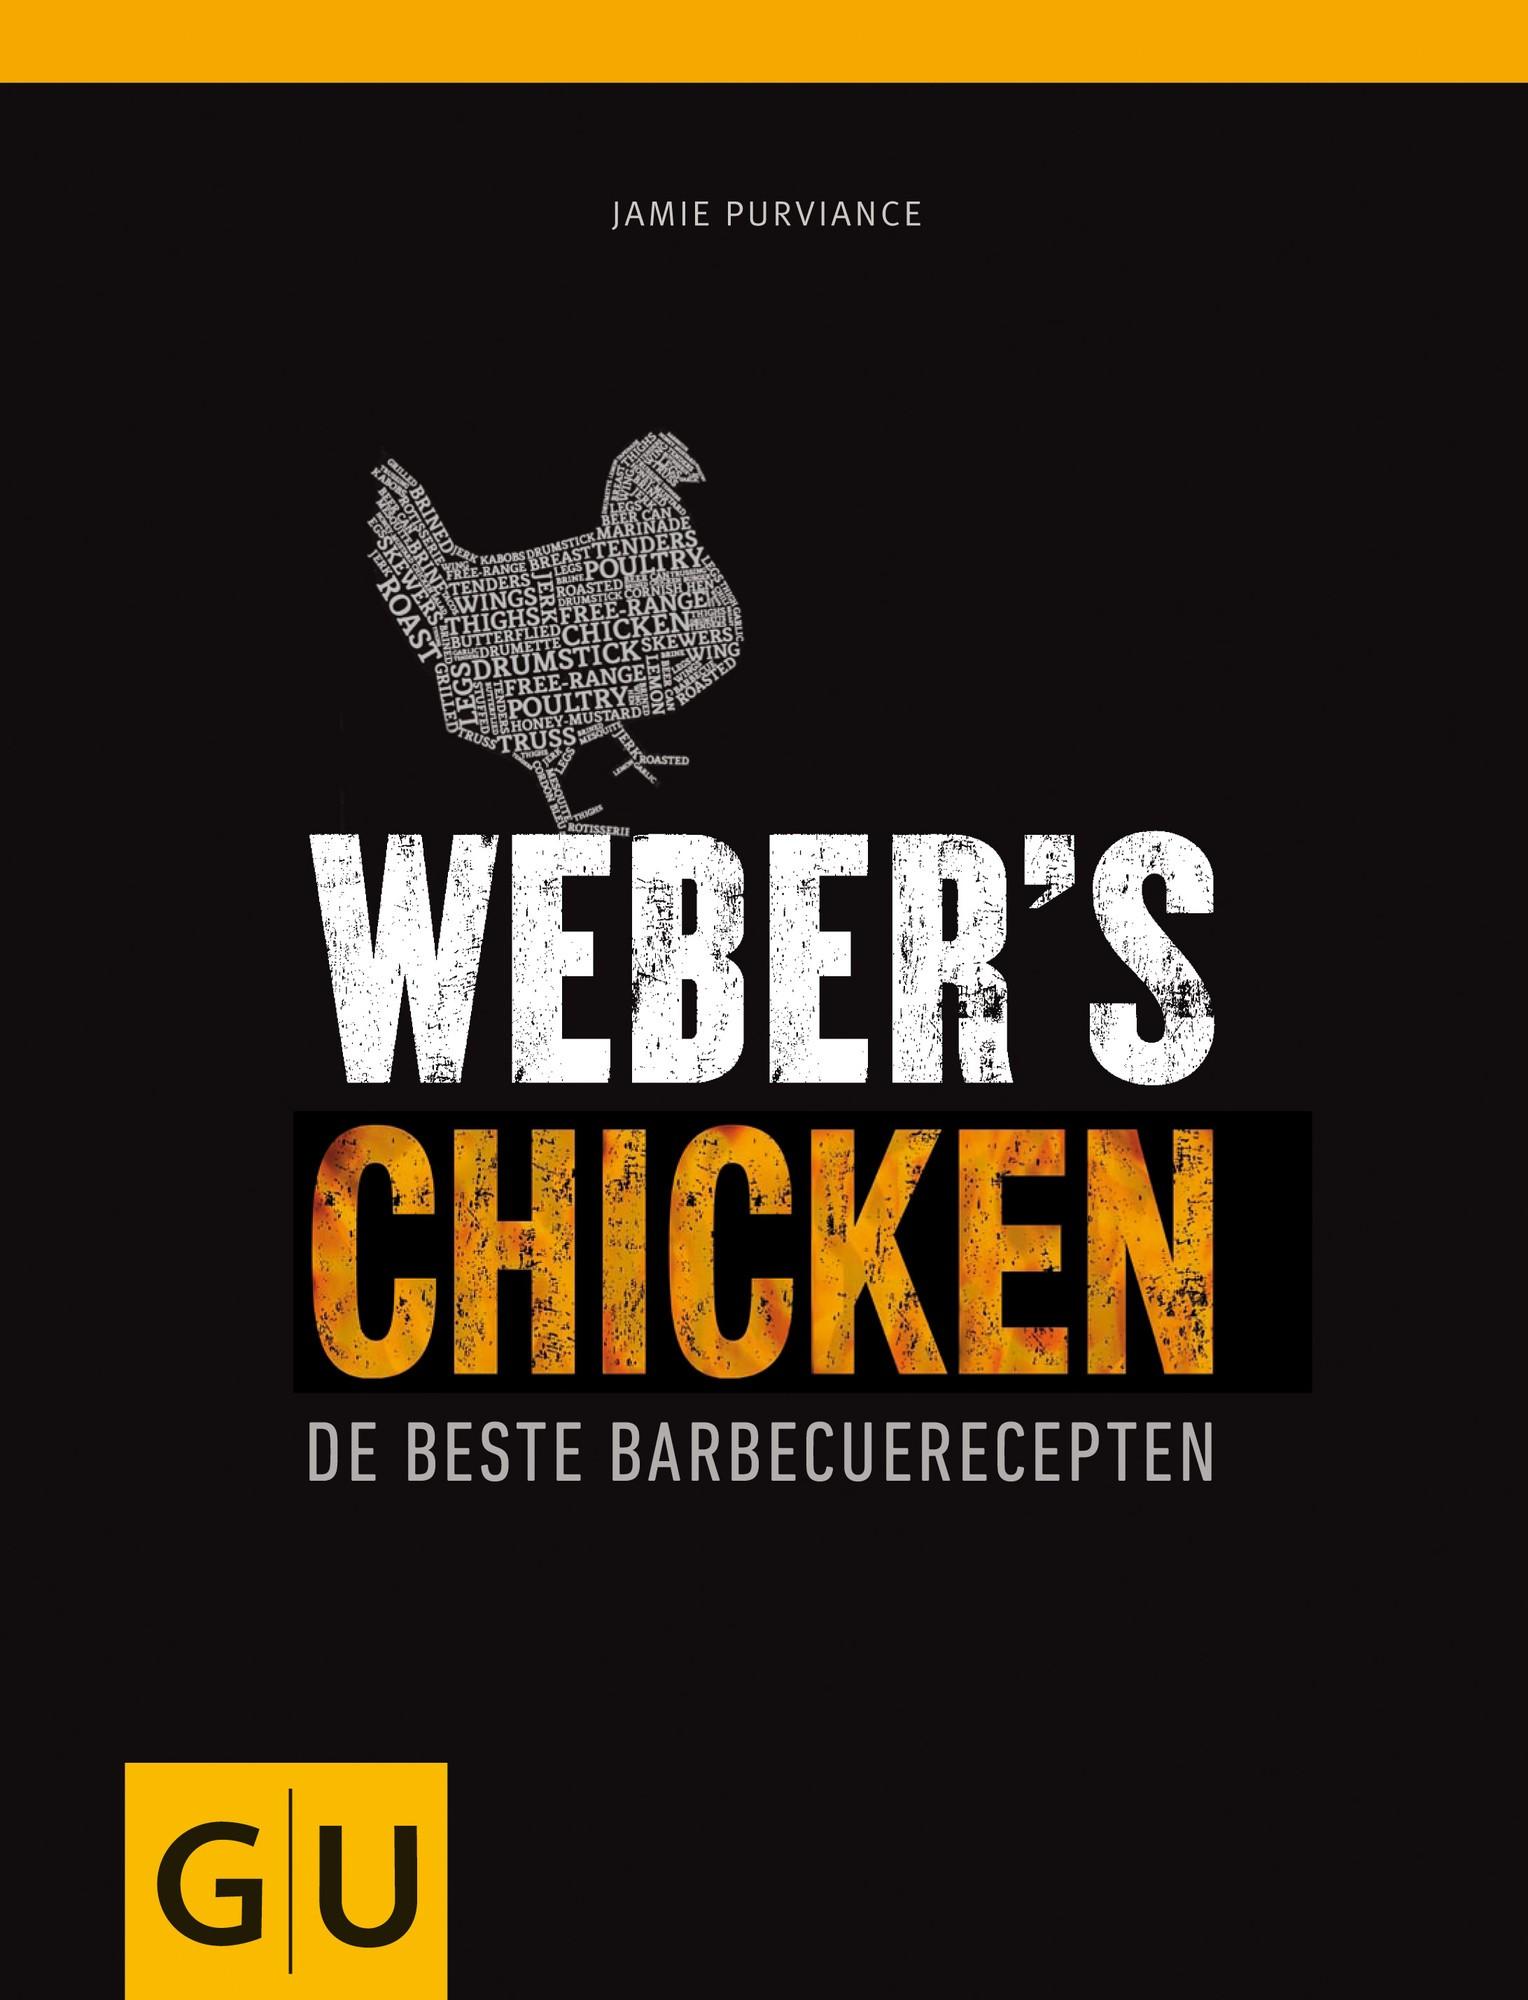 Boeks chicken nl